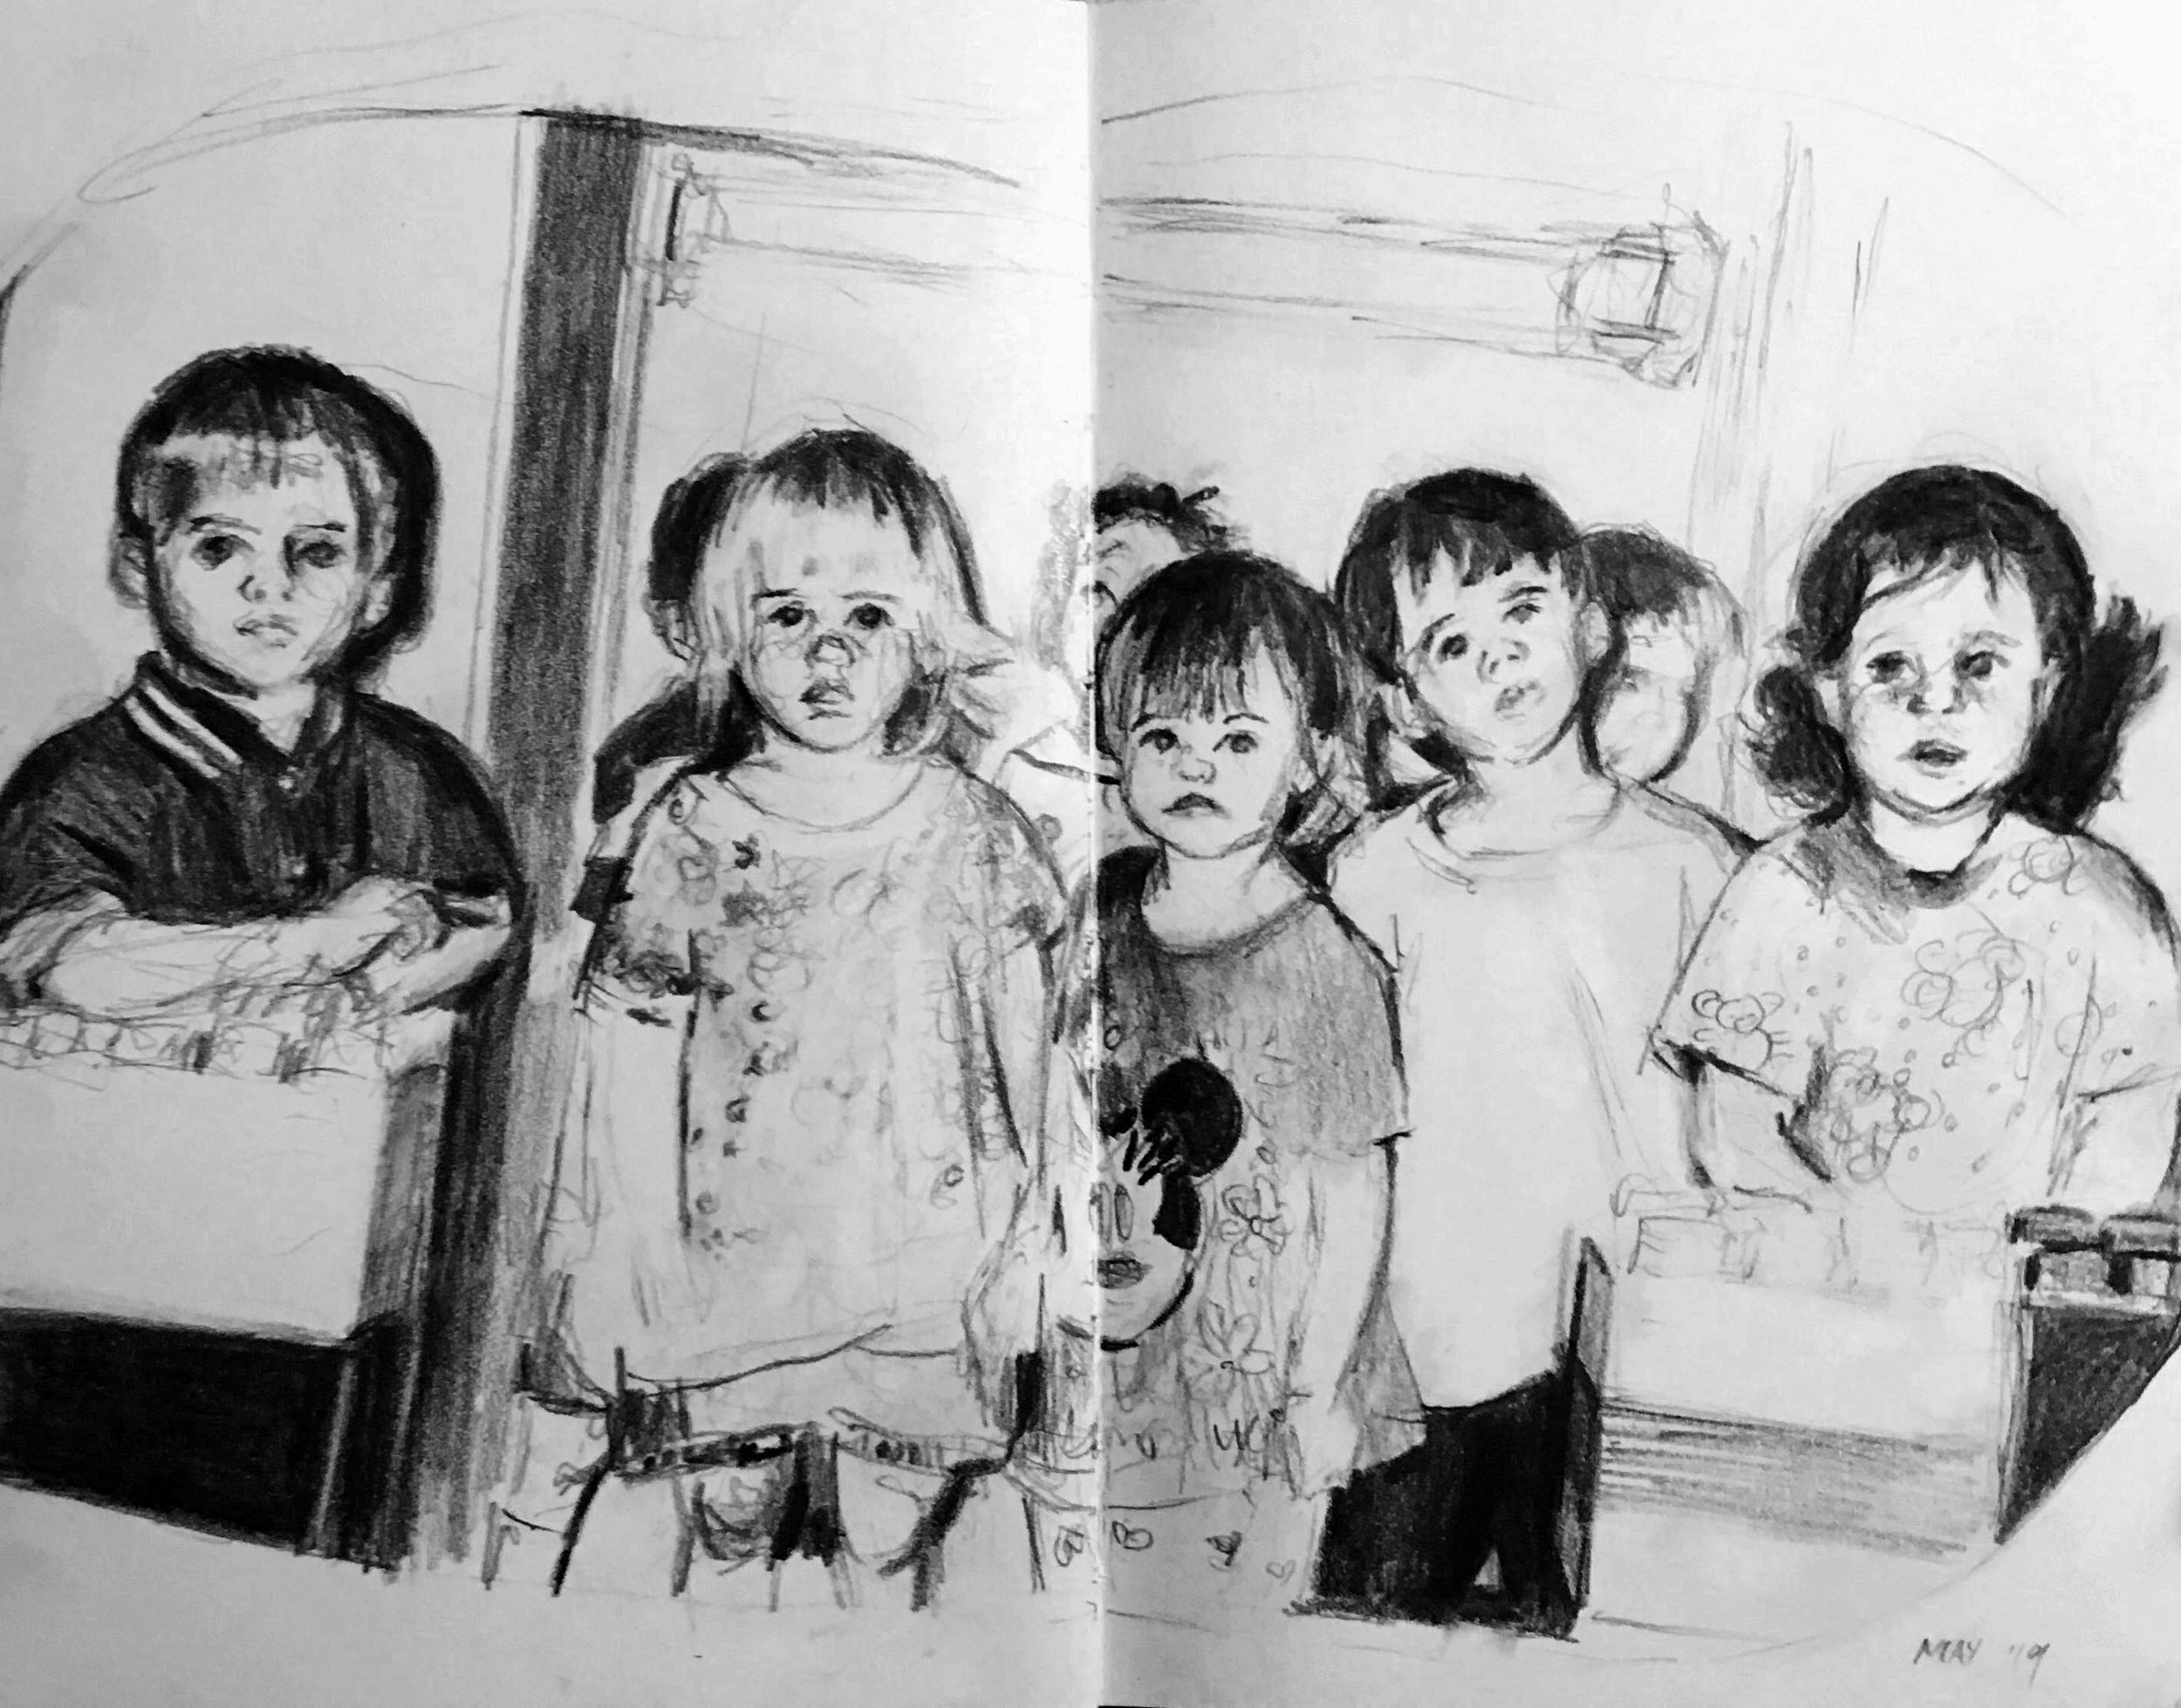 Preschool Crew Edited copy.jpg